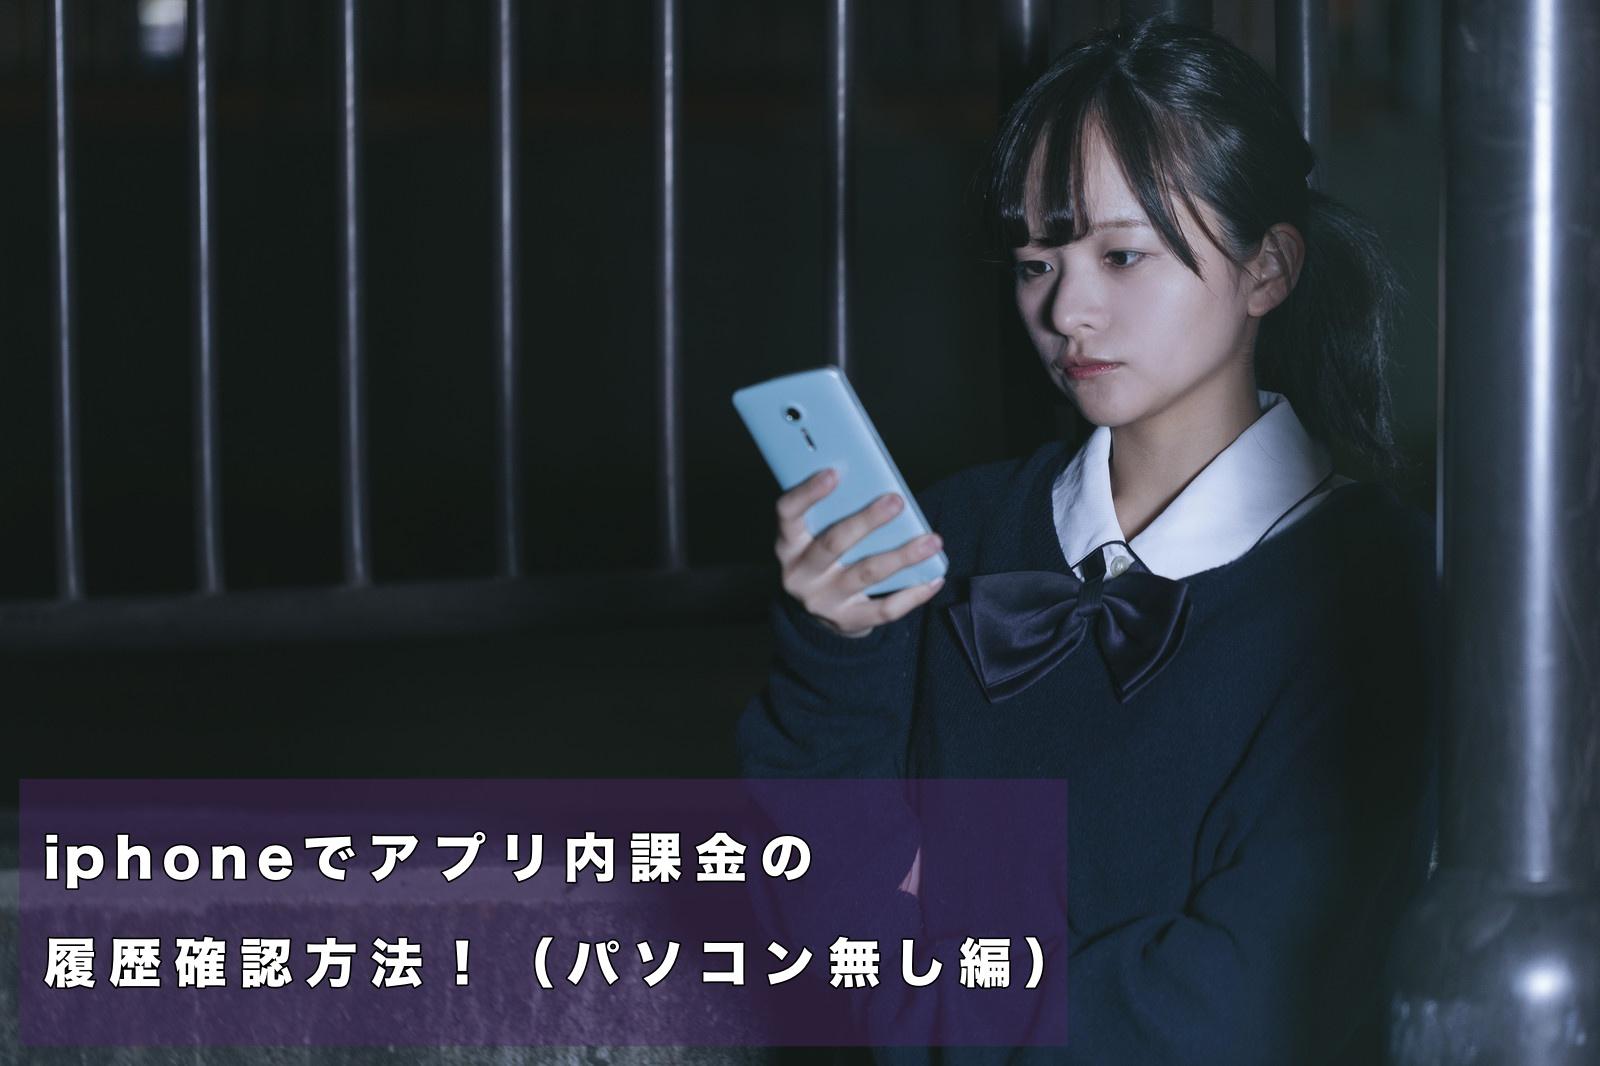 iphoneでアプリ内課金の履歴確認方法!(パソコン無し編)